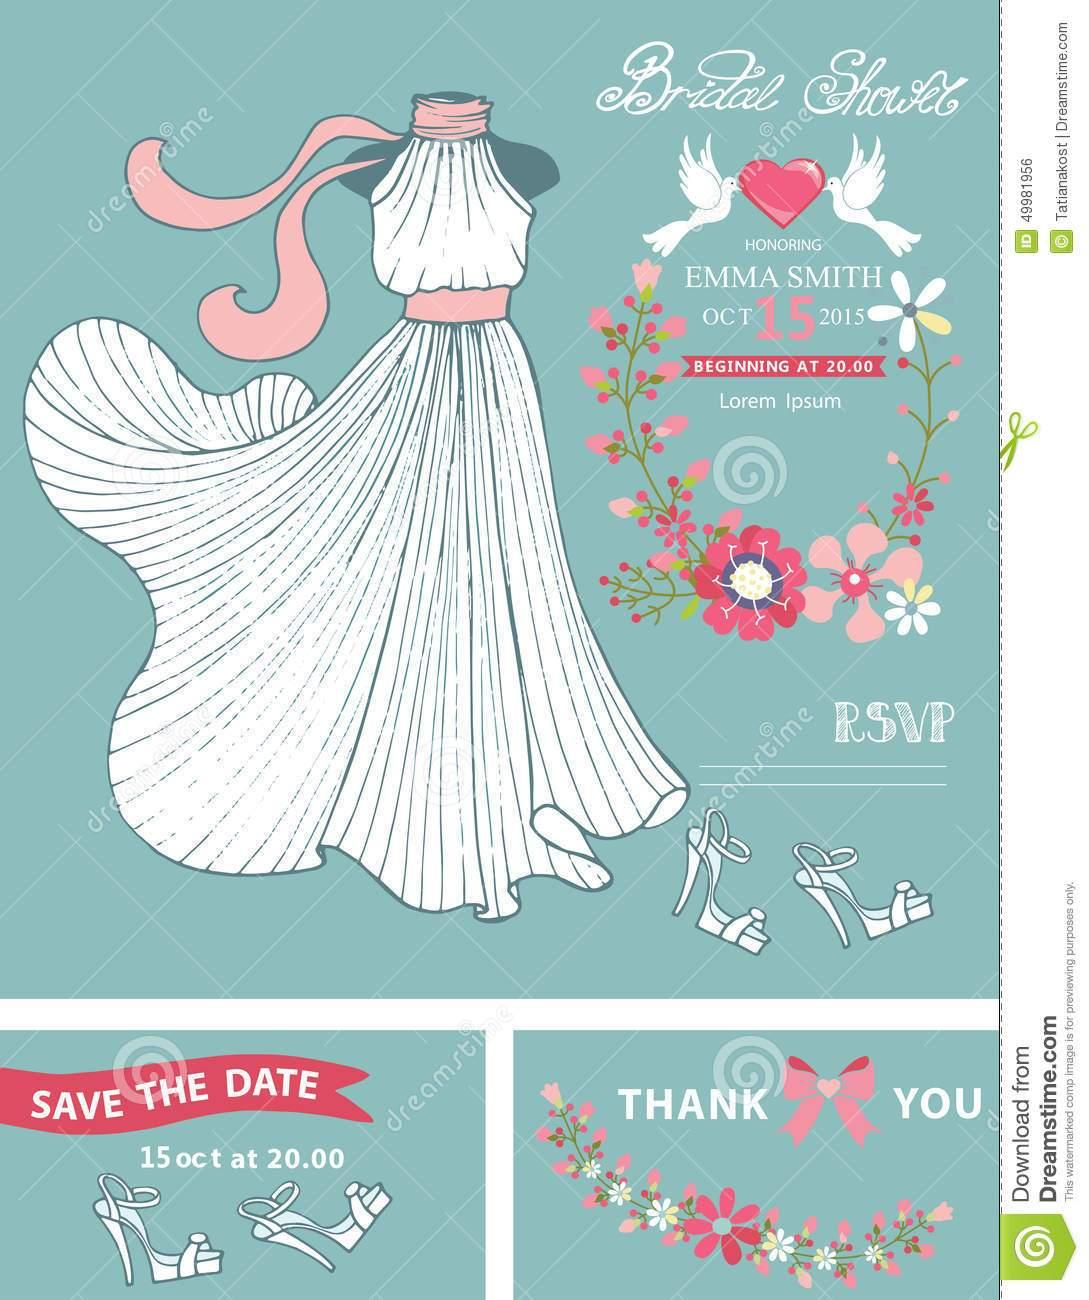 Dress Shaped Invitation Template